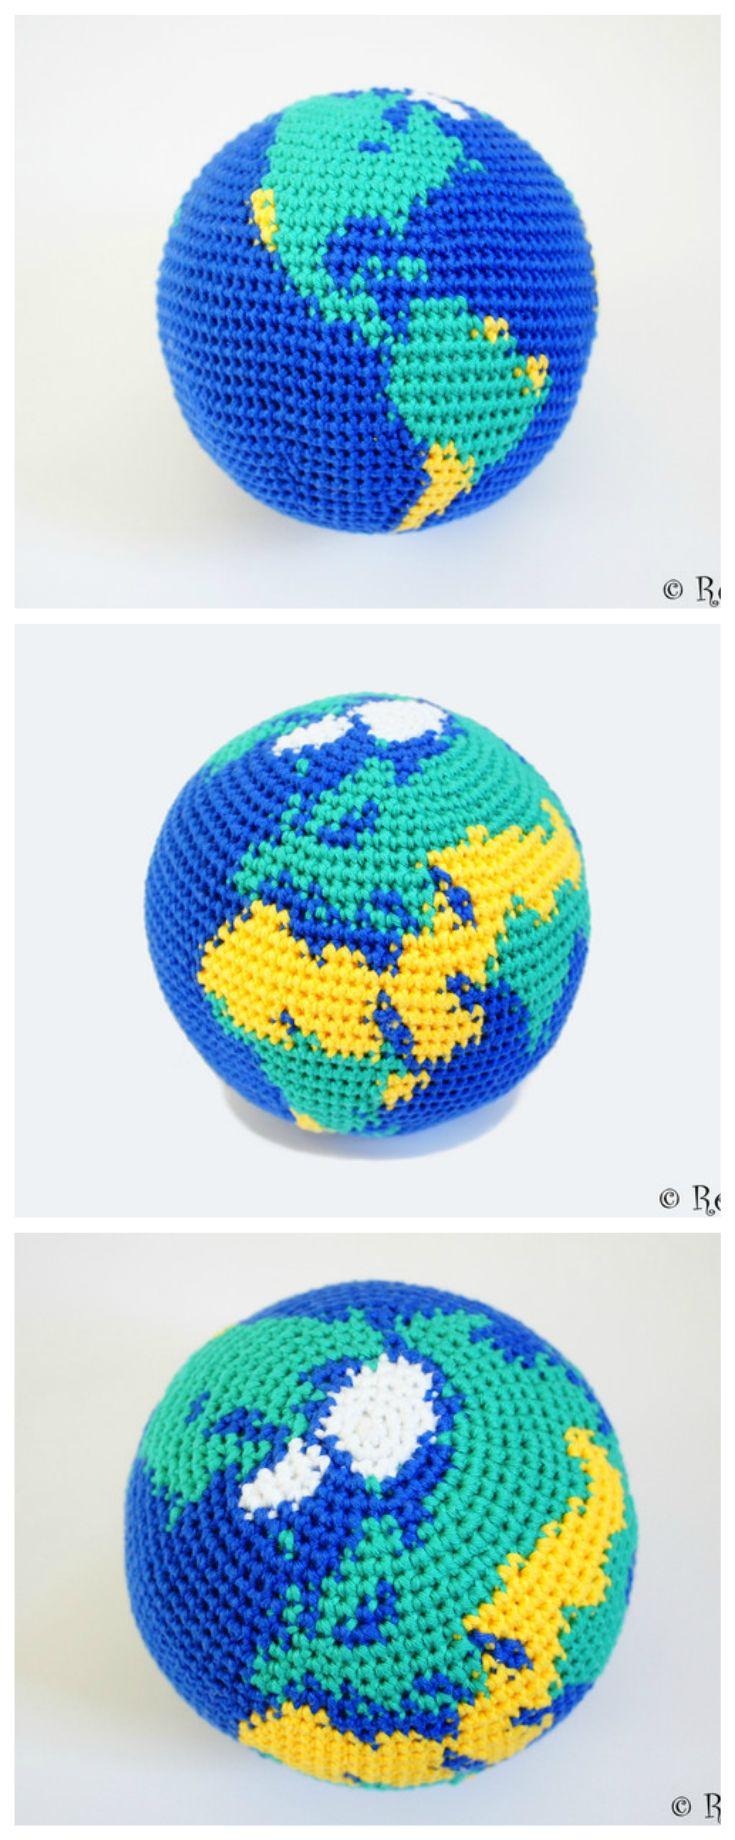 Häkelanleitung für deine eigene Weltkugel/ crochet instructions for your very own globe made by Renirumi via DaWanda.com